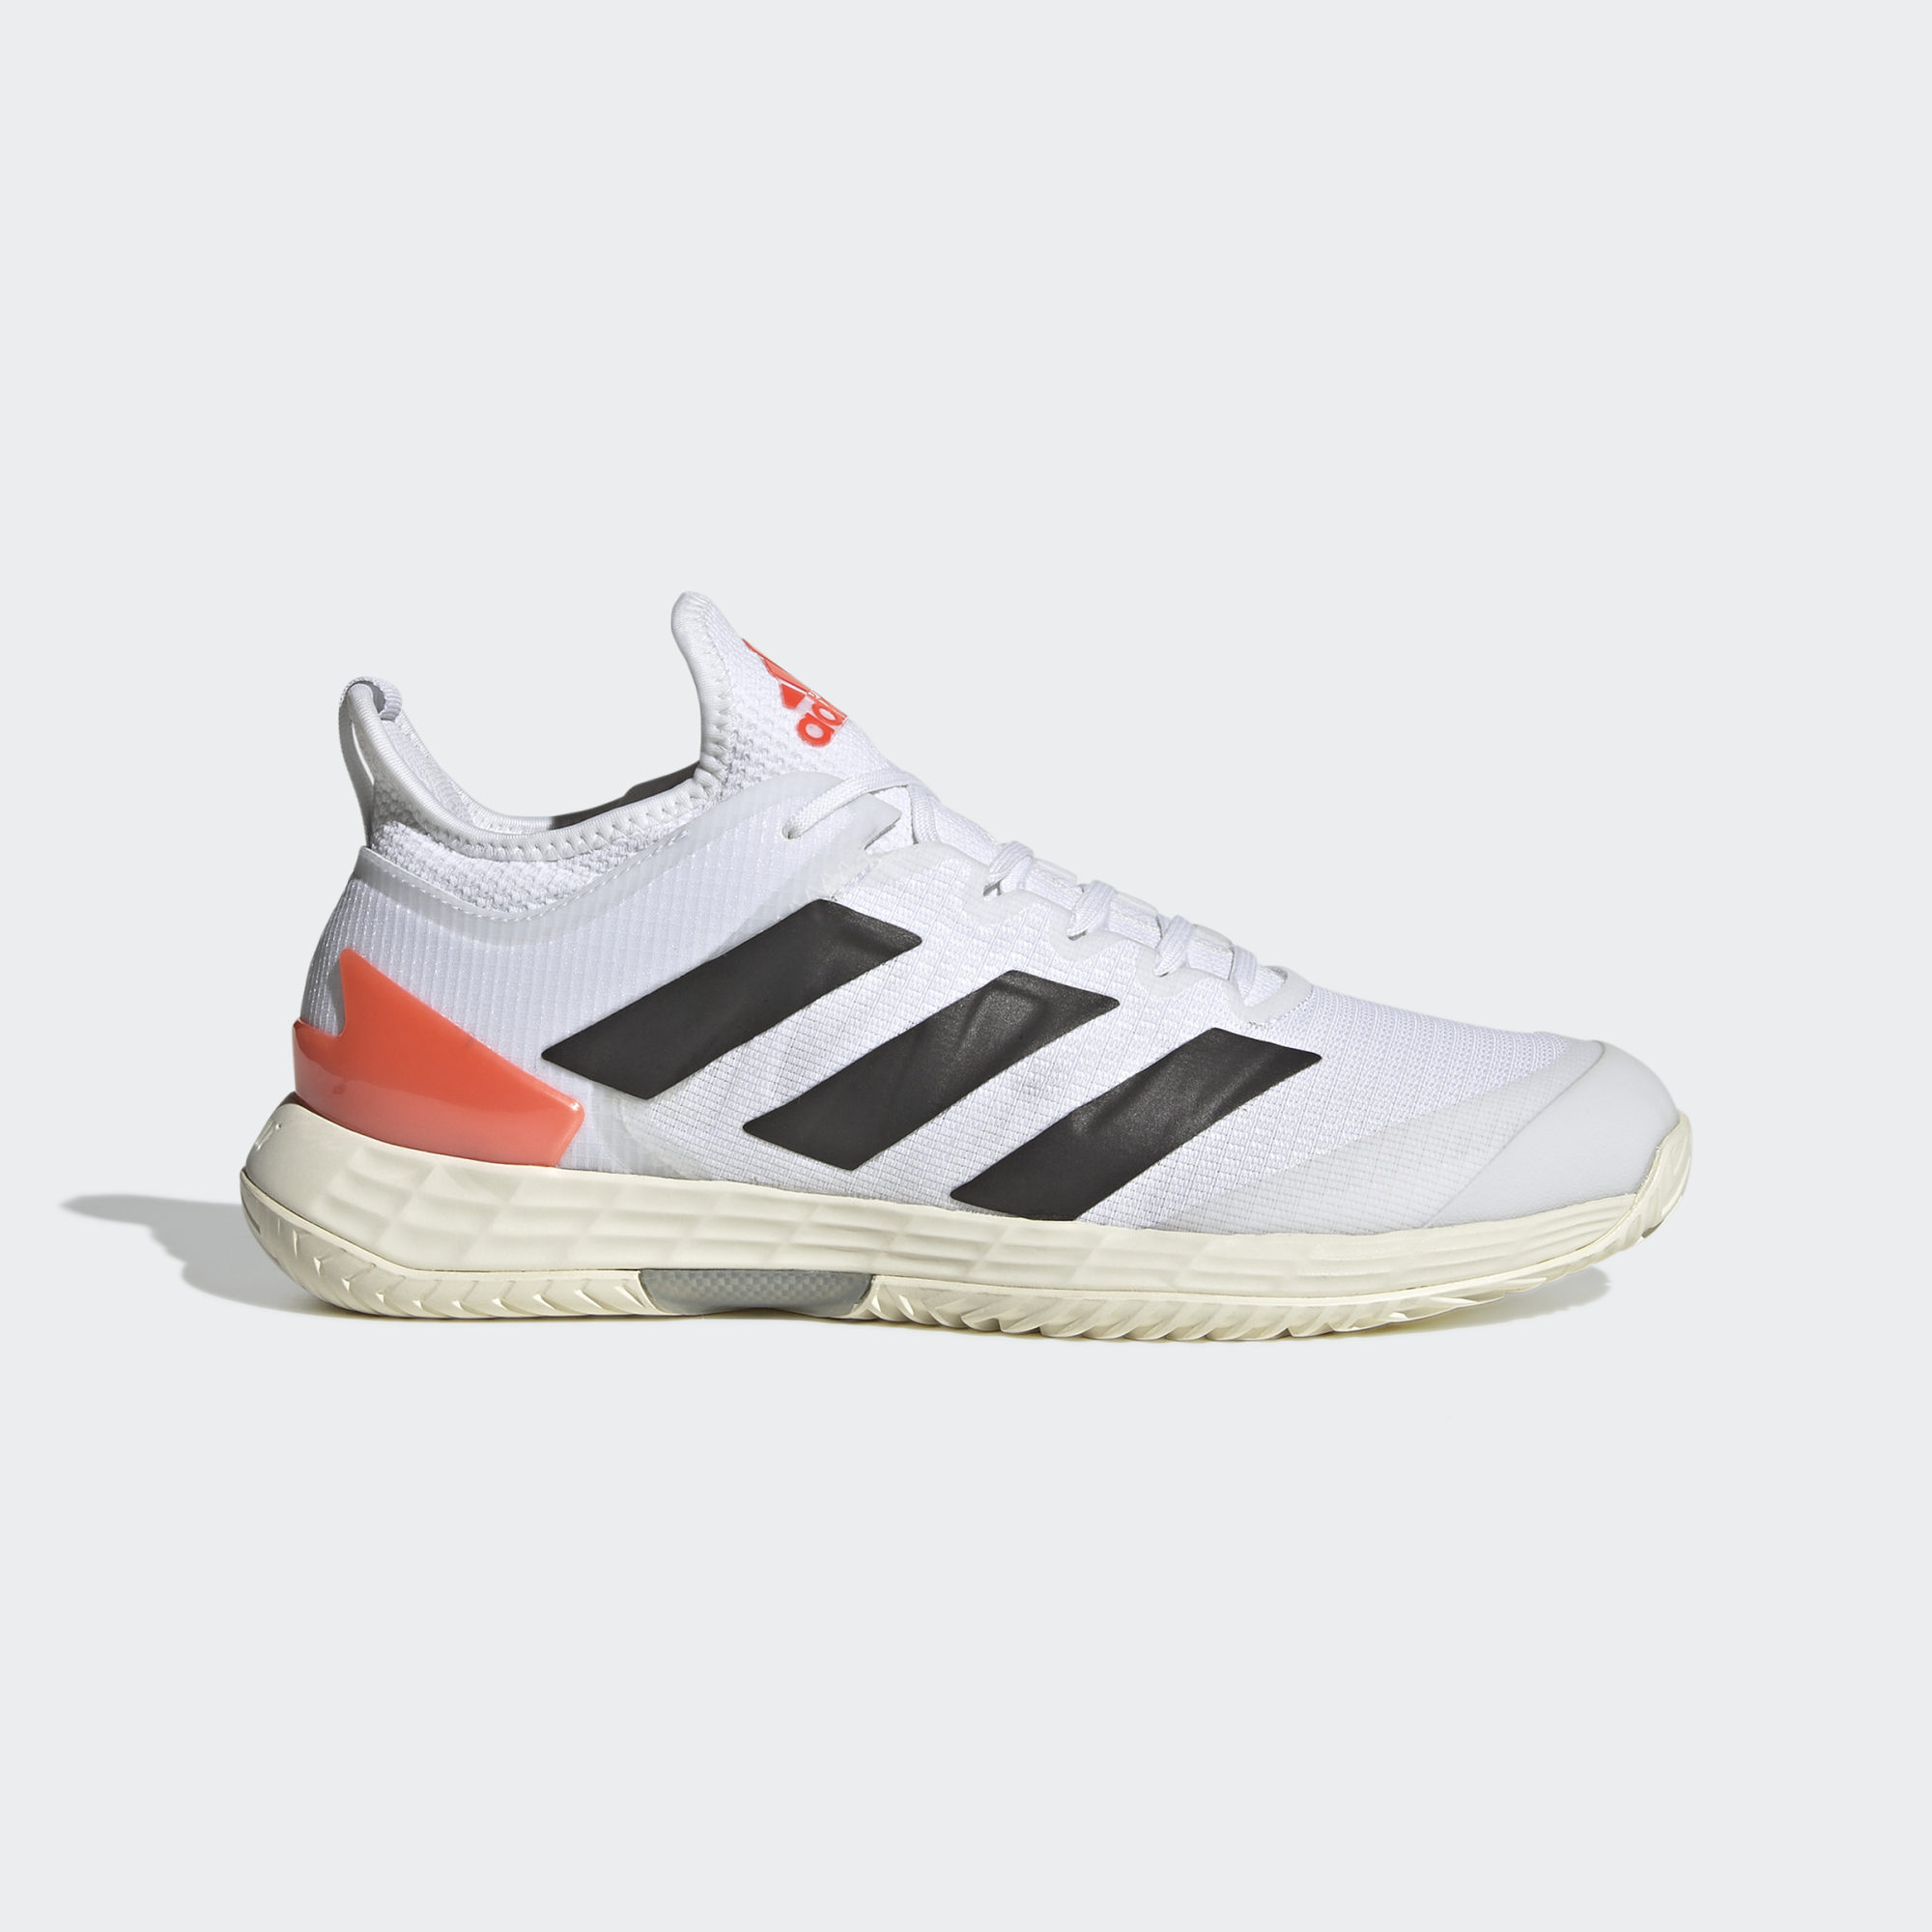 best white tennis shoes - Adidas ubersonic tokyo